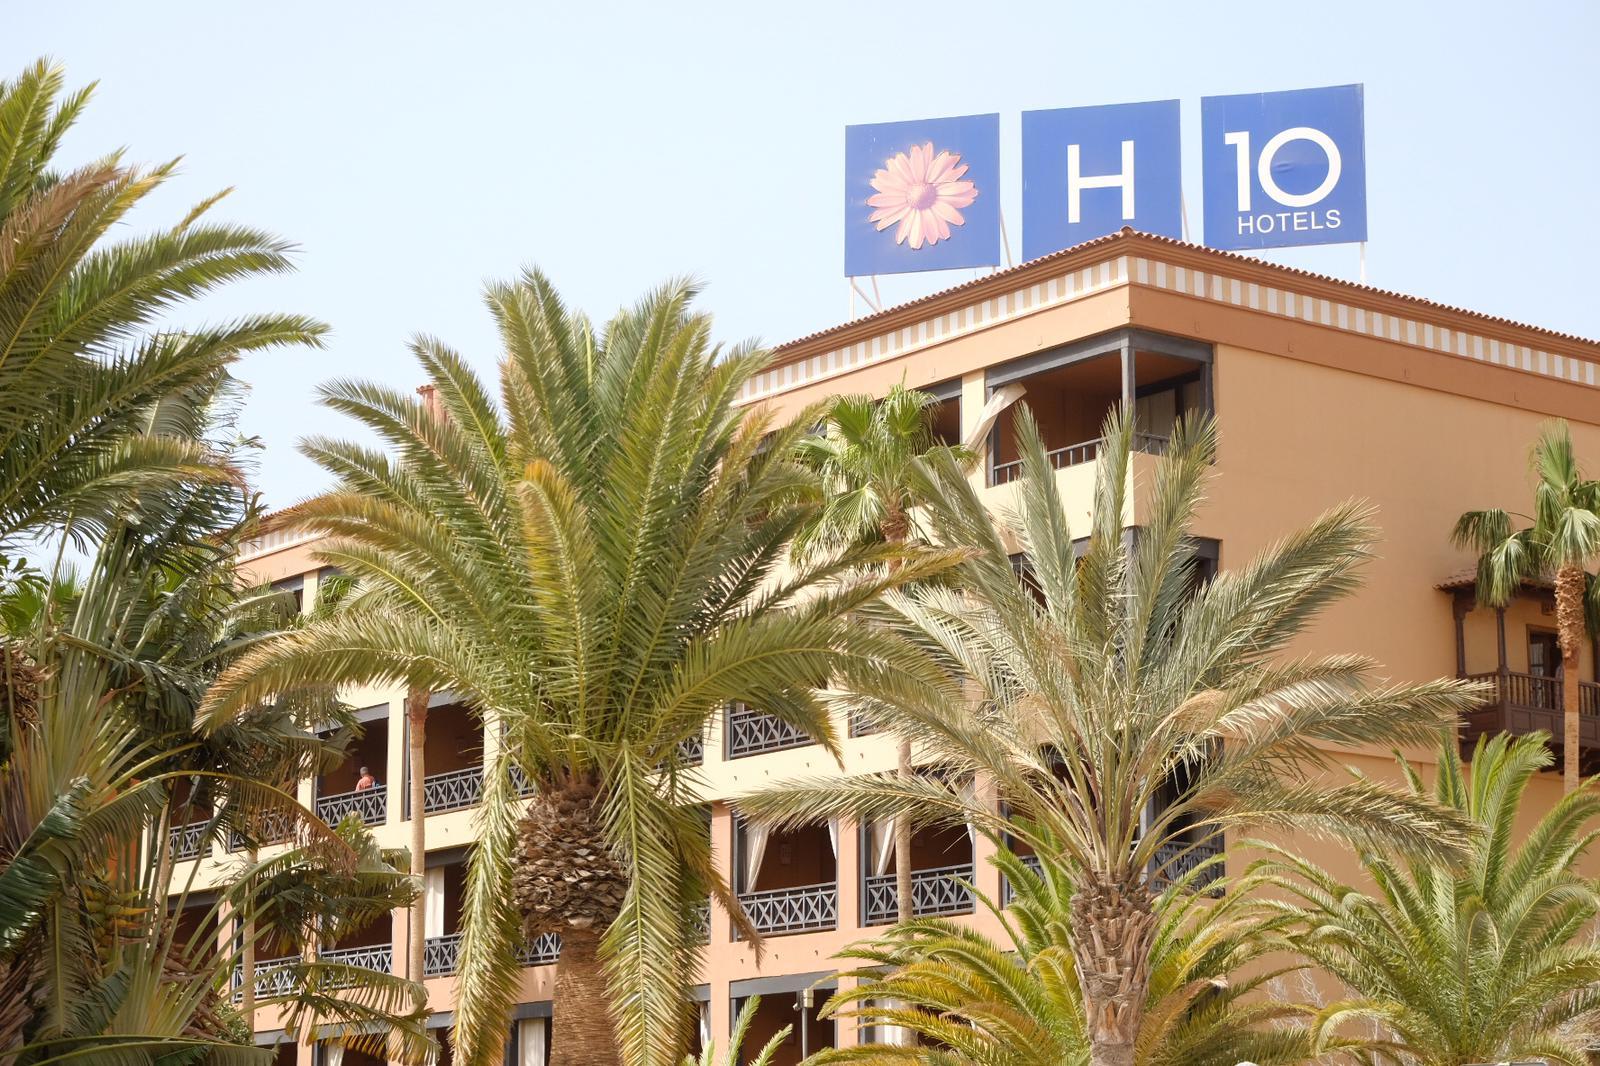 hotel adeje coronavirus 9